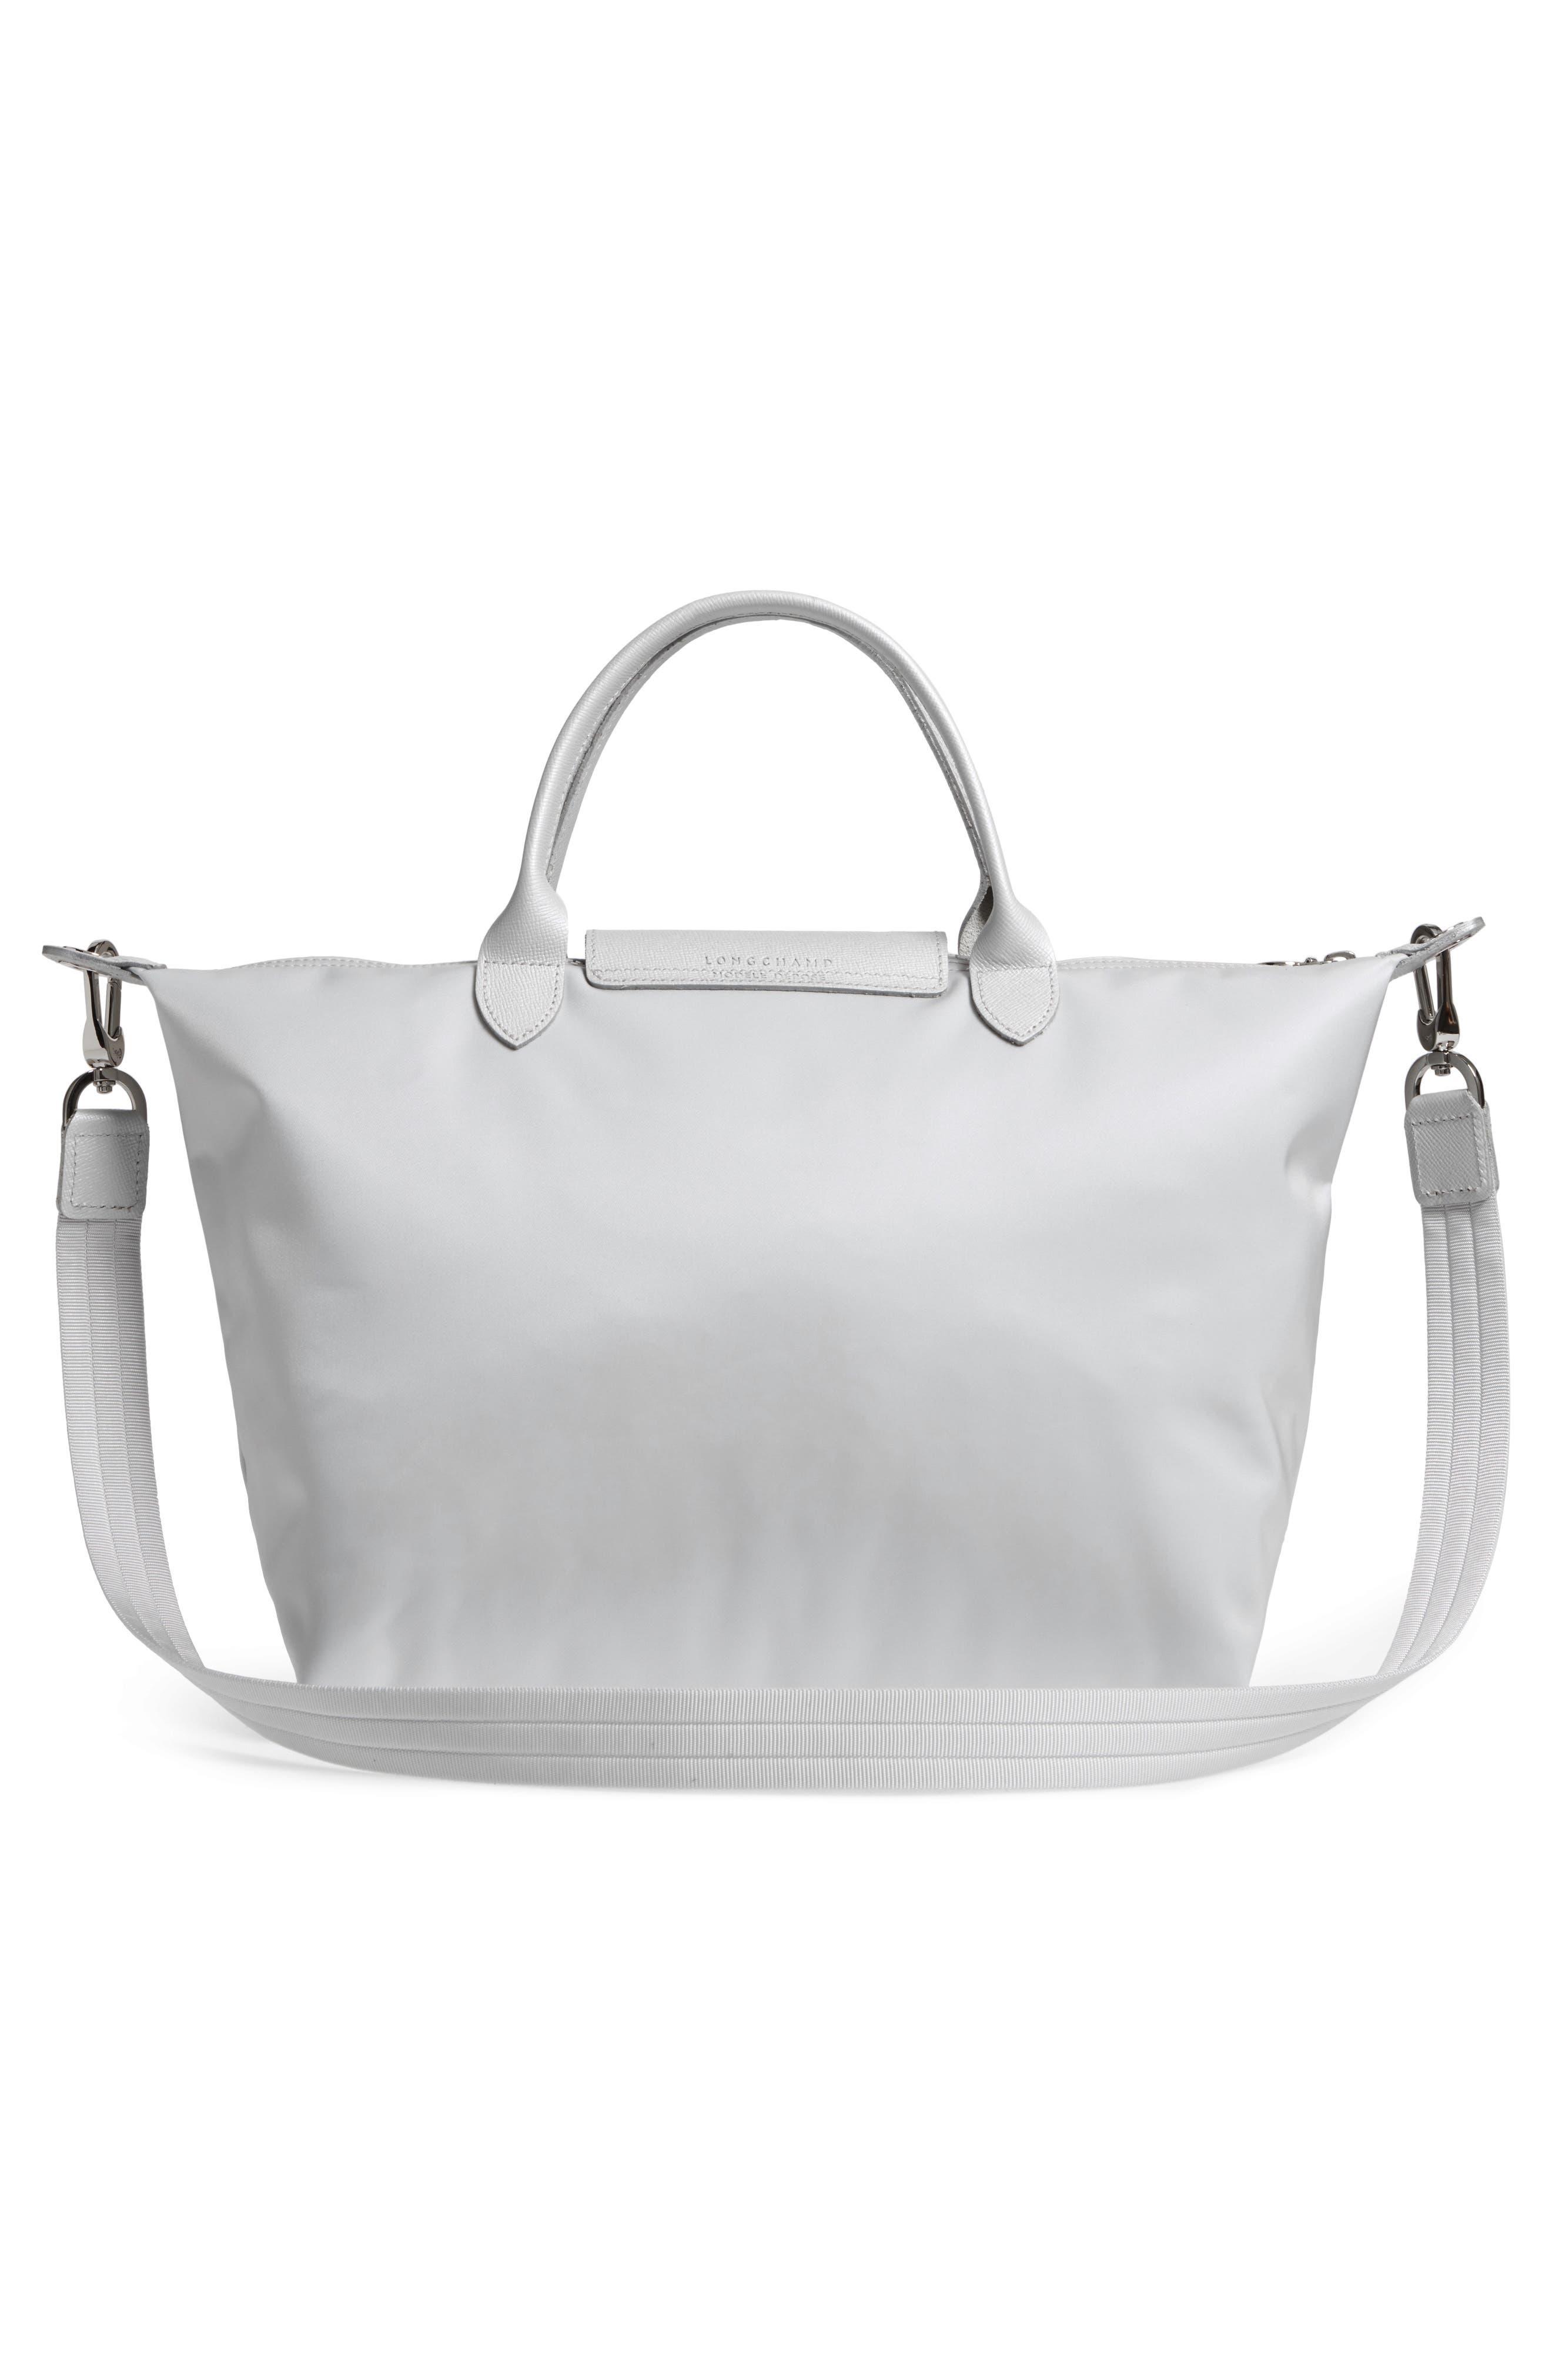 Alternate Image 3  - Longchamp 'Medium Le Pliage Neo' Nylon Tote